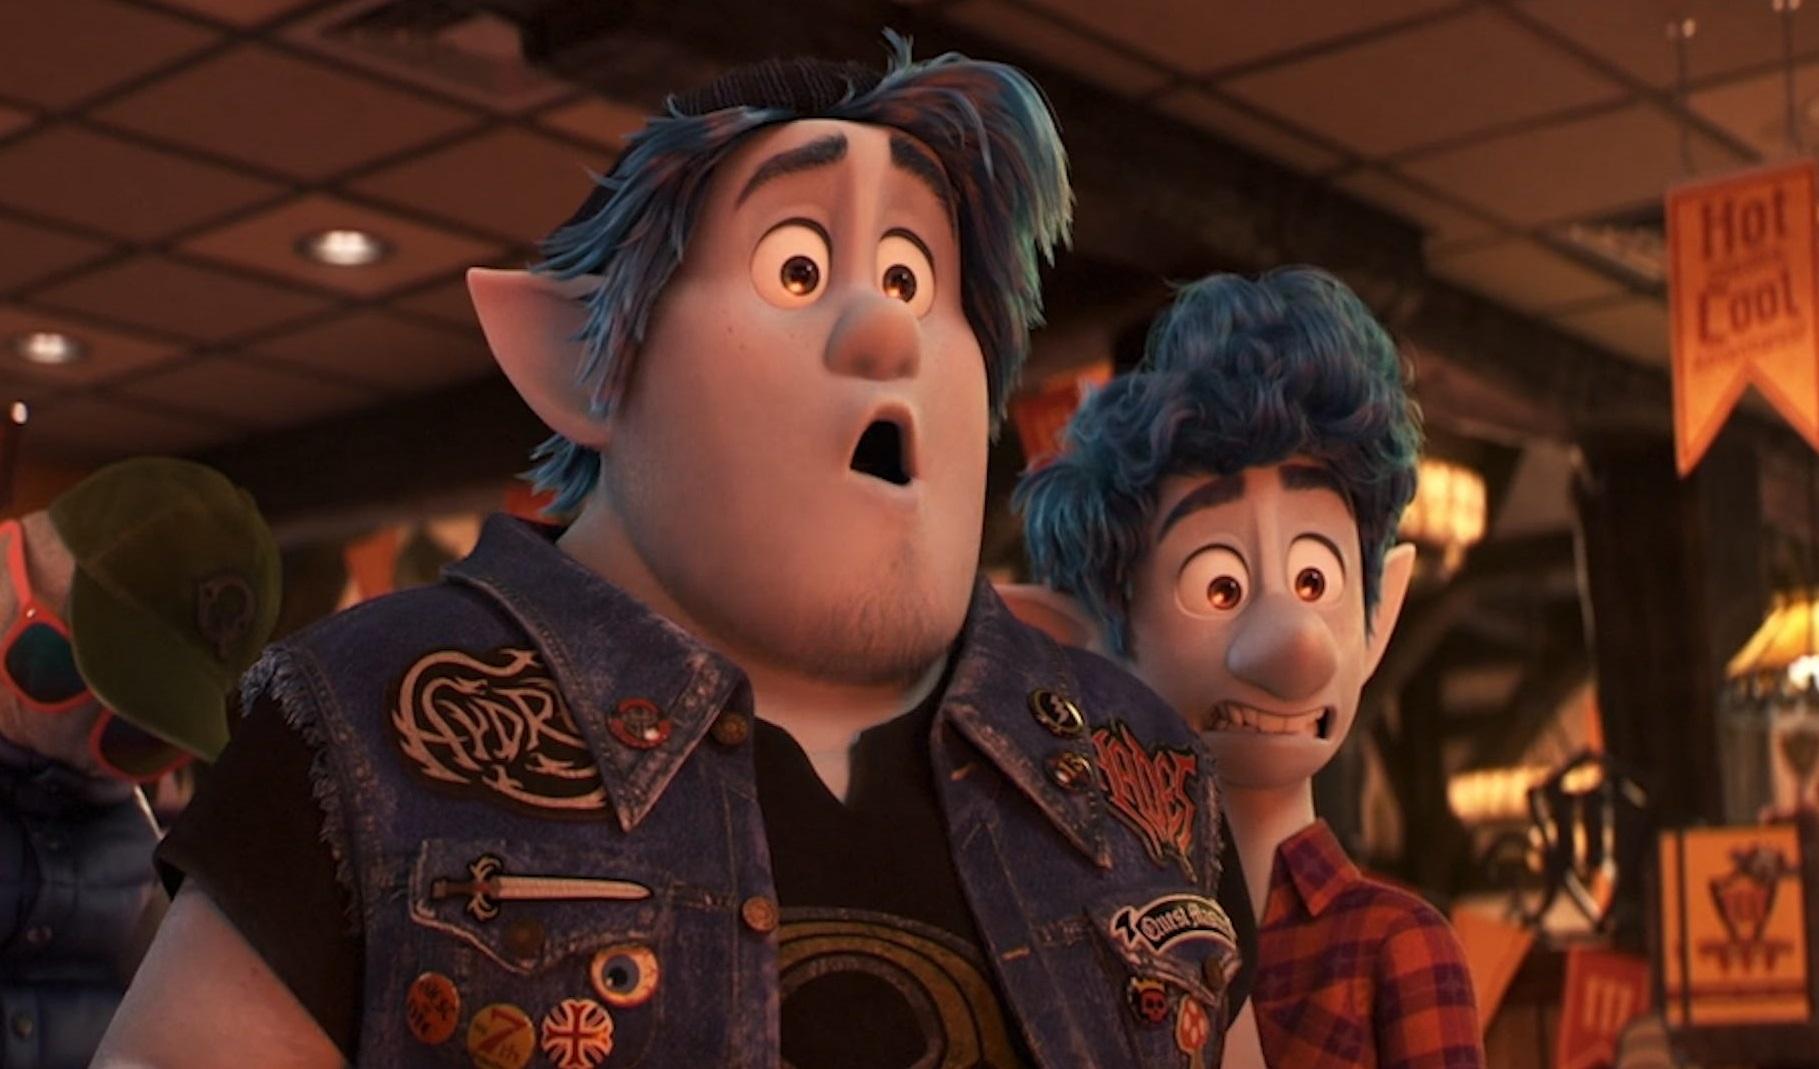 szmk_onward_elore_pixar_disney_animaacos_film_14.jpg